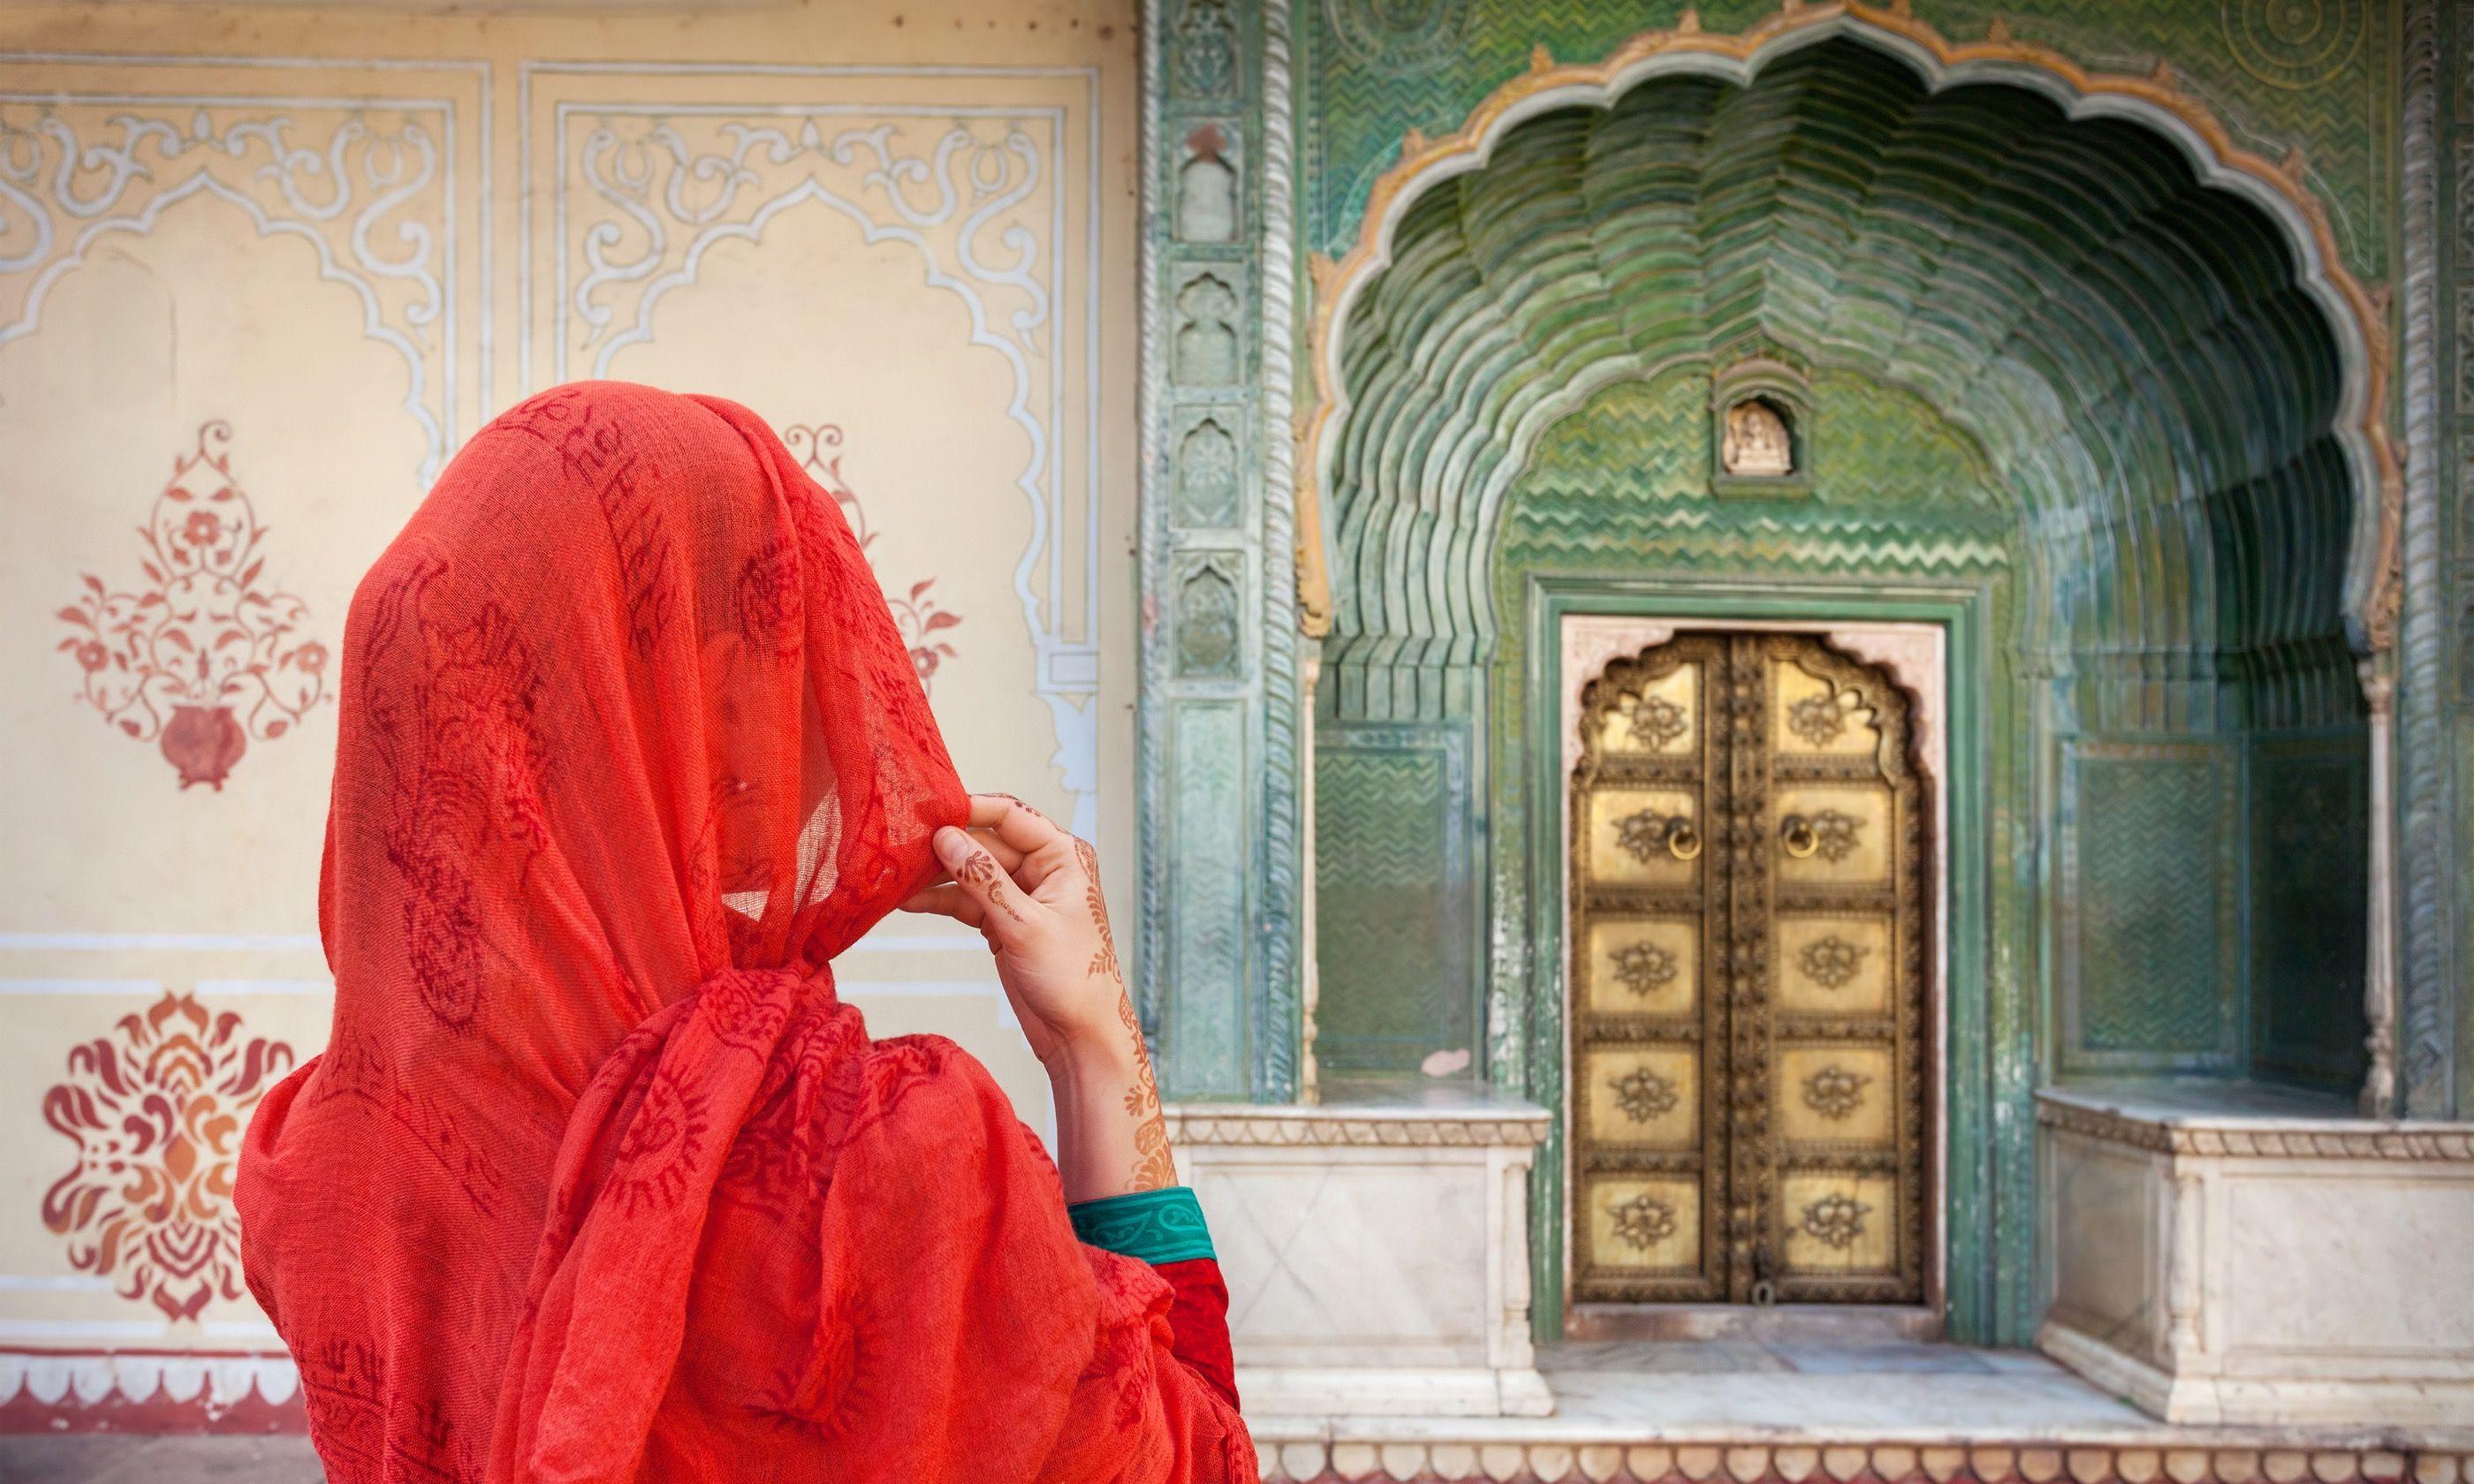 he backstreets of Jaipur (Dreamstime)